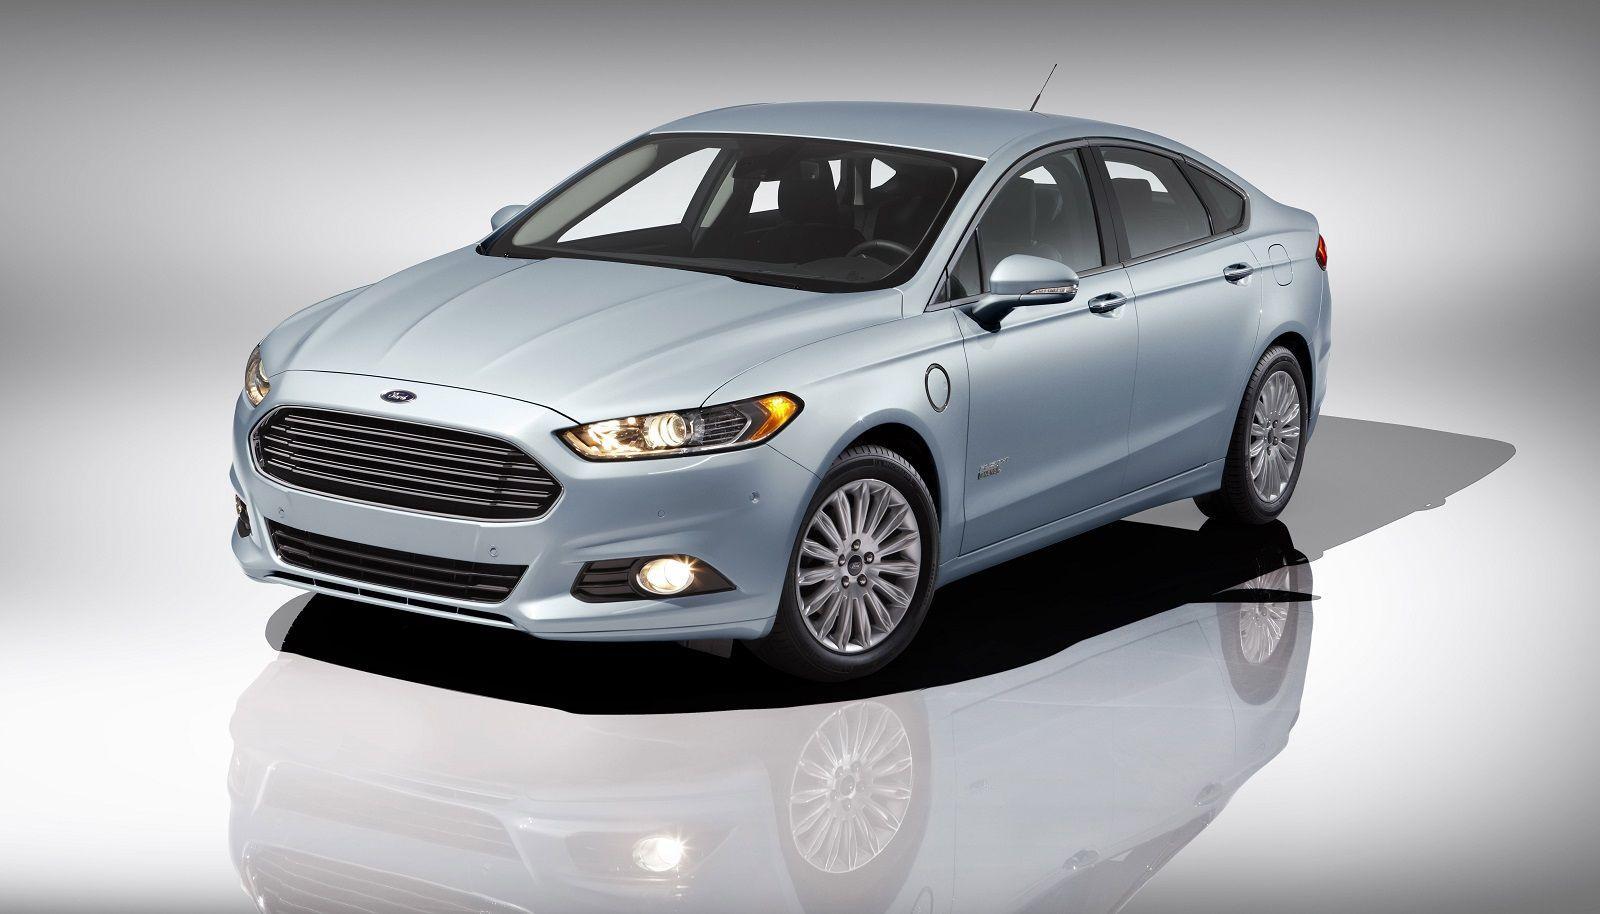 2014 Ford Fusion Ford Fusion Ford Fusion Energi 2013 Ford Fusion